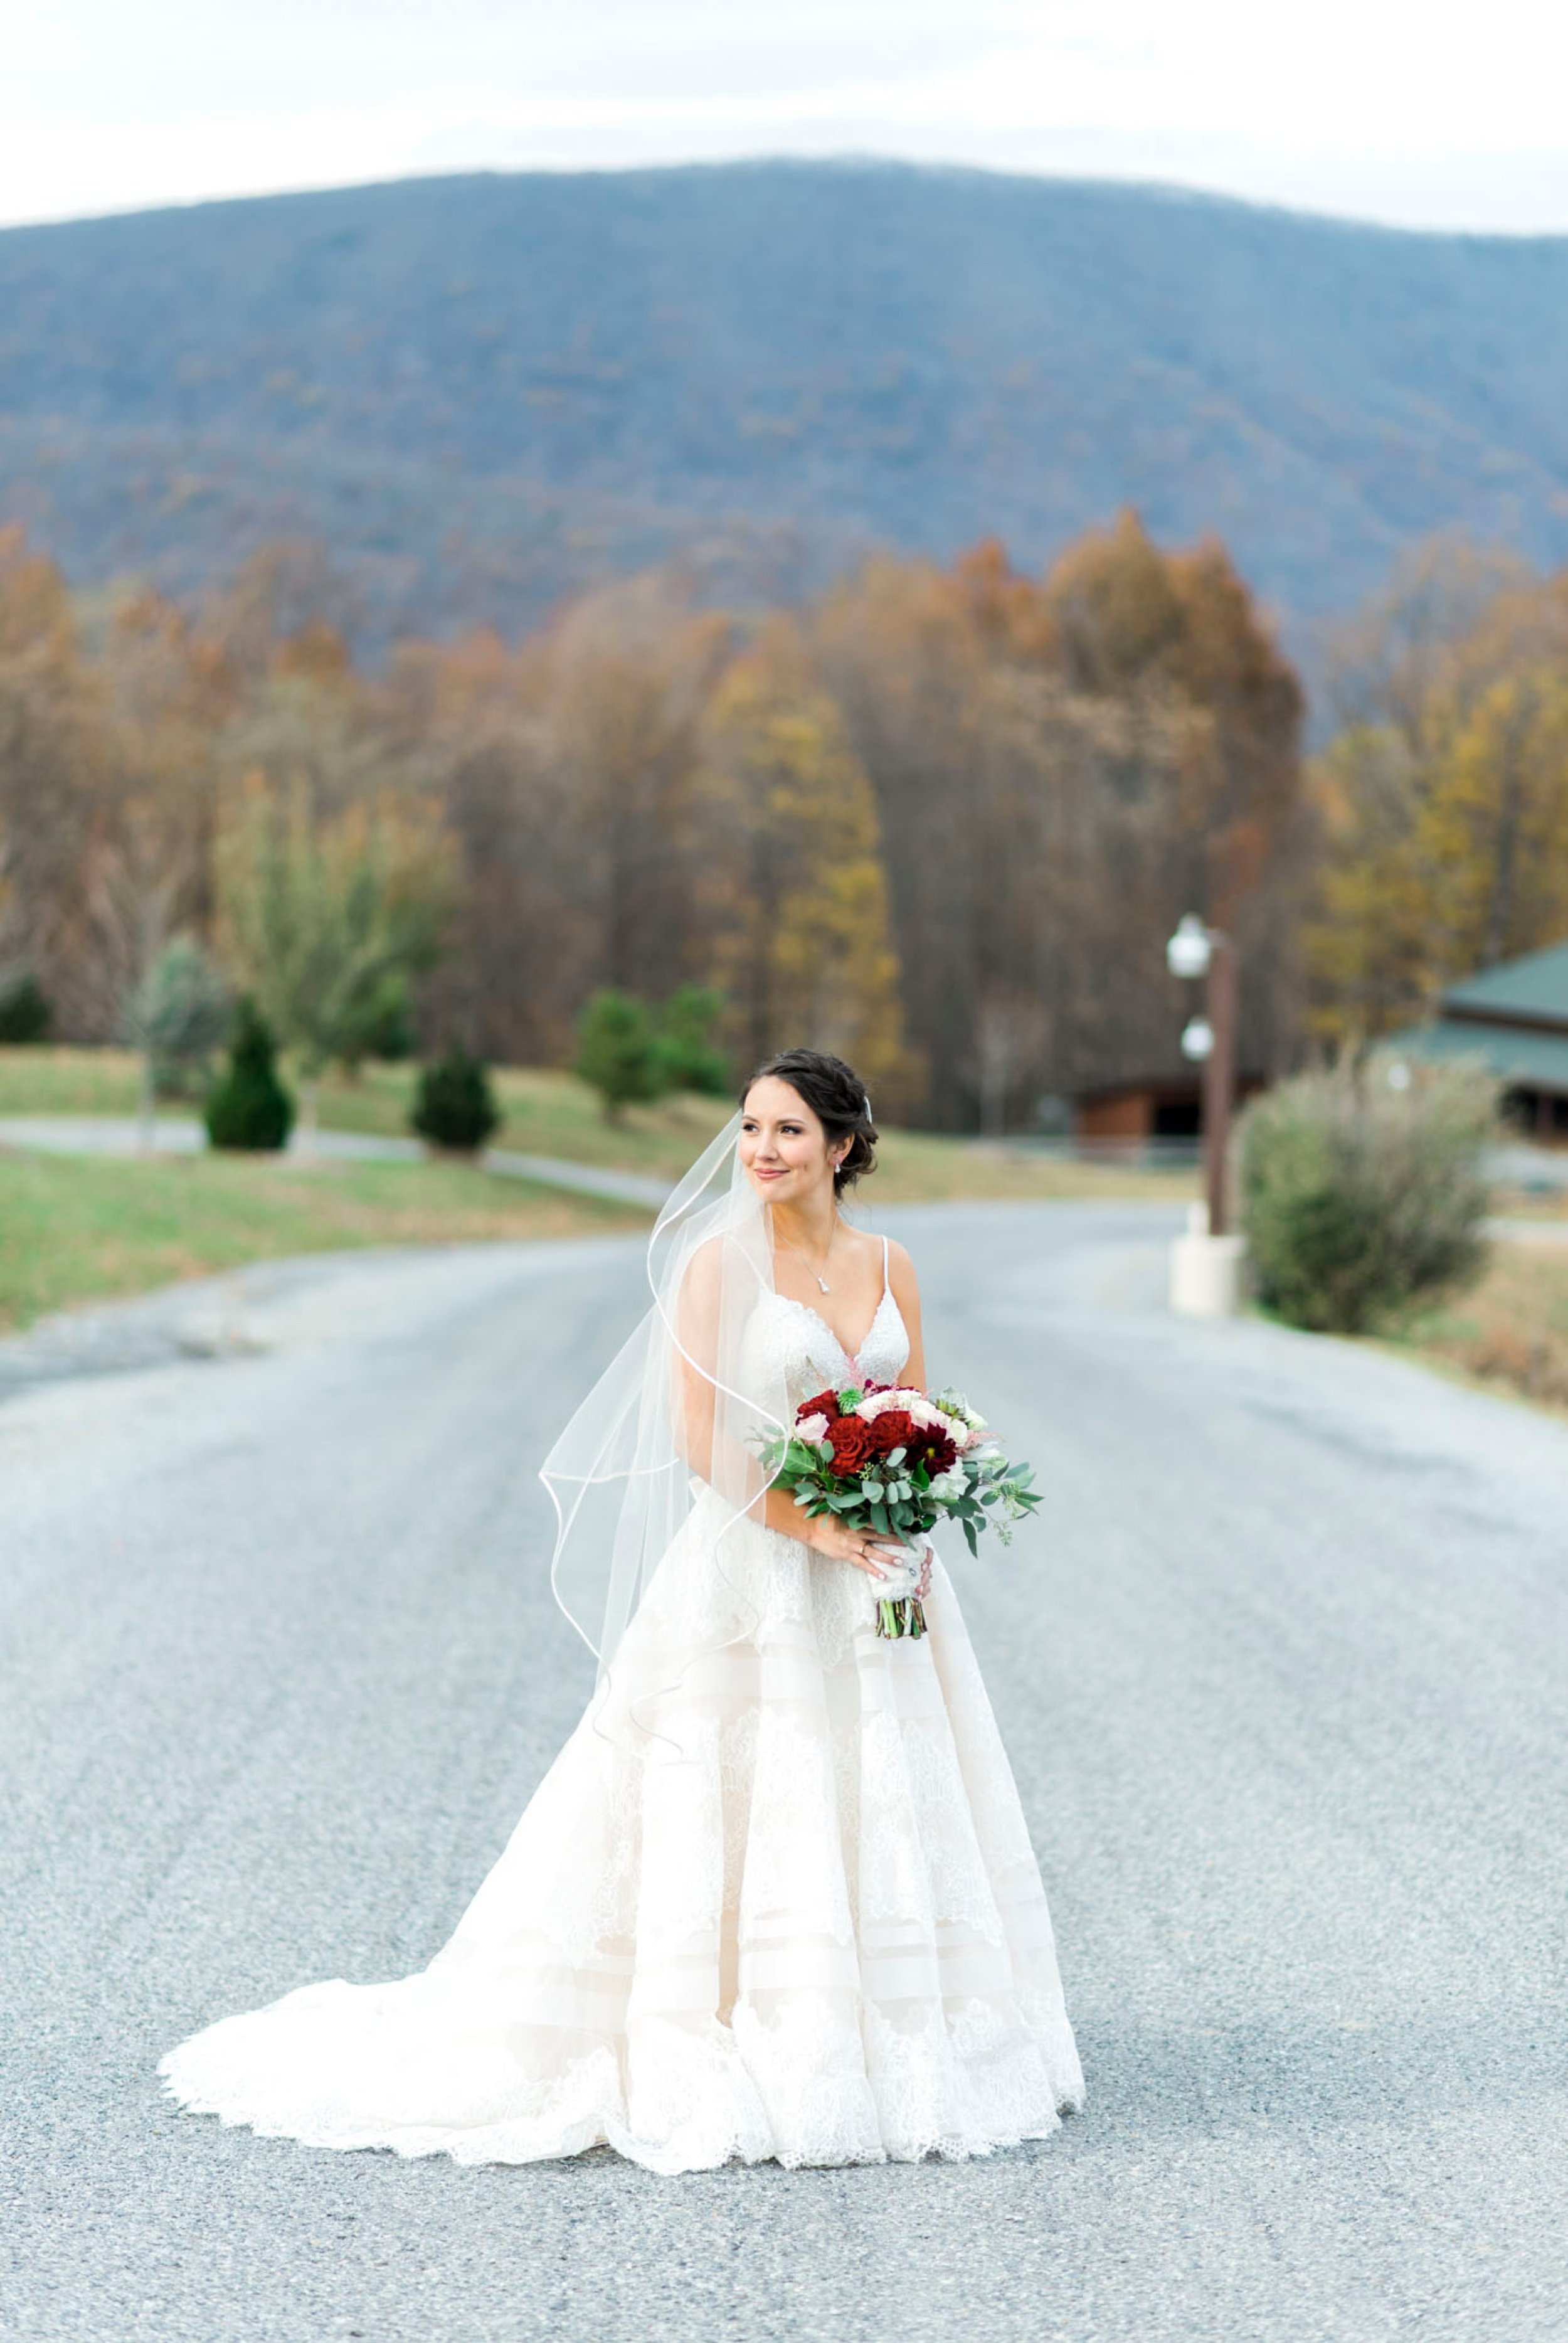 IrvineEstate_LexingtonVA_Wedding_FallWedding_VirginiaWeddingPhotographer 43.jpg